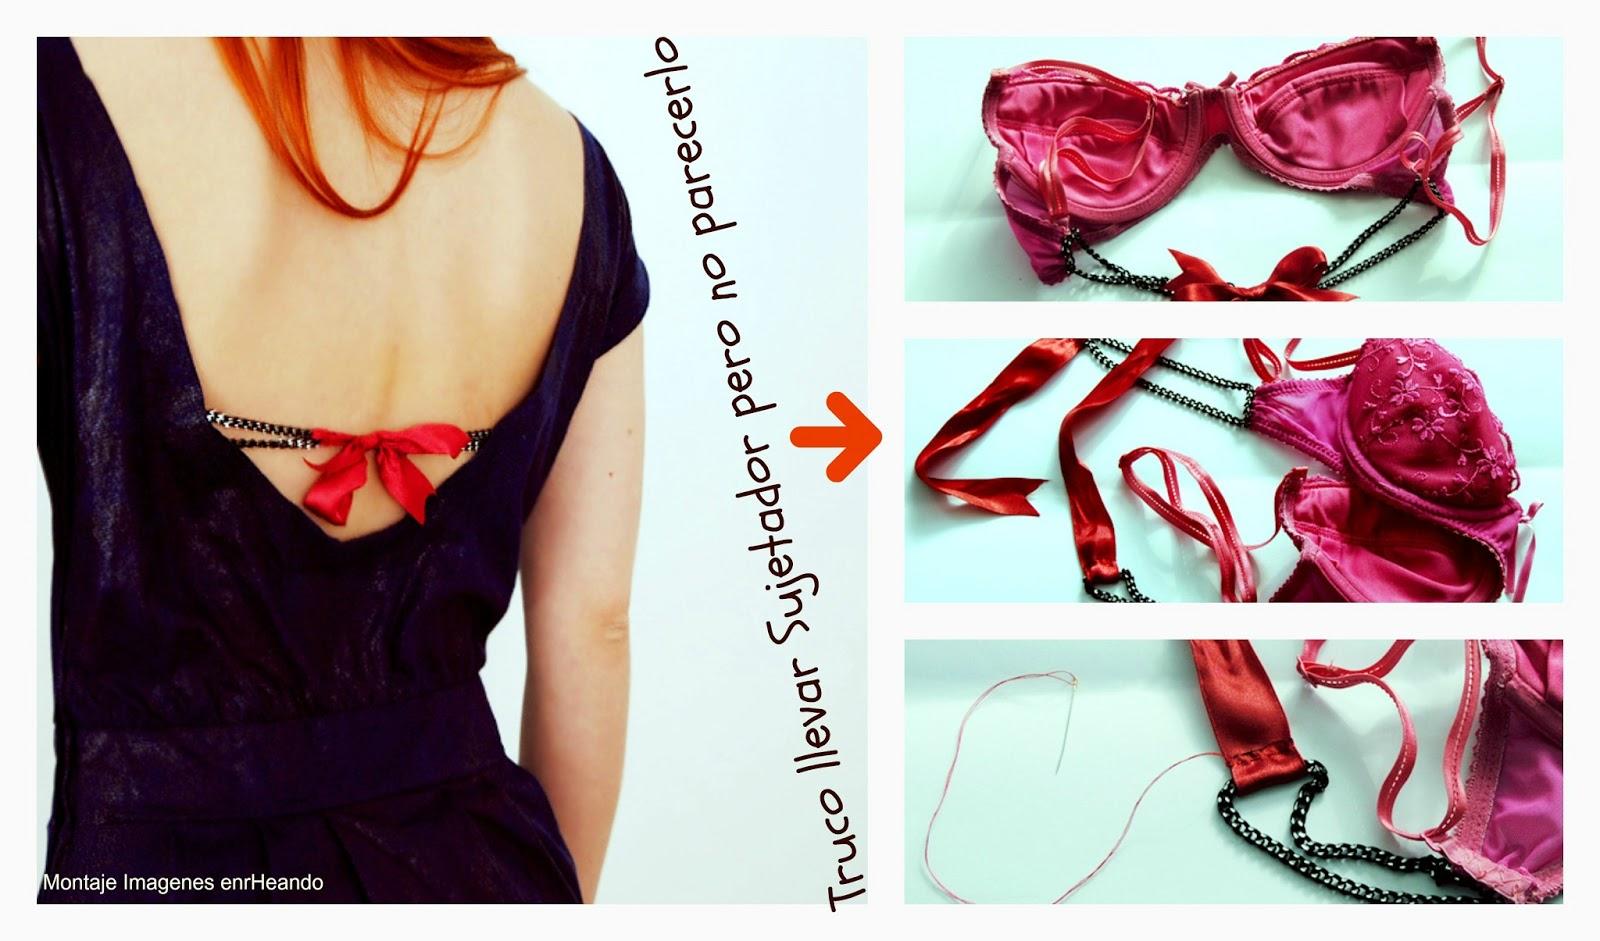 sujetador, sostén, diys, bricomoda, reciclar, customizar, costura